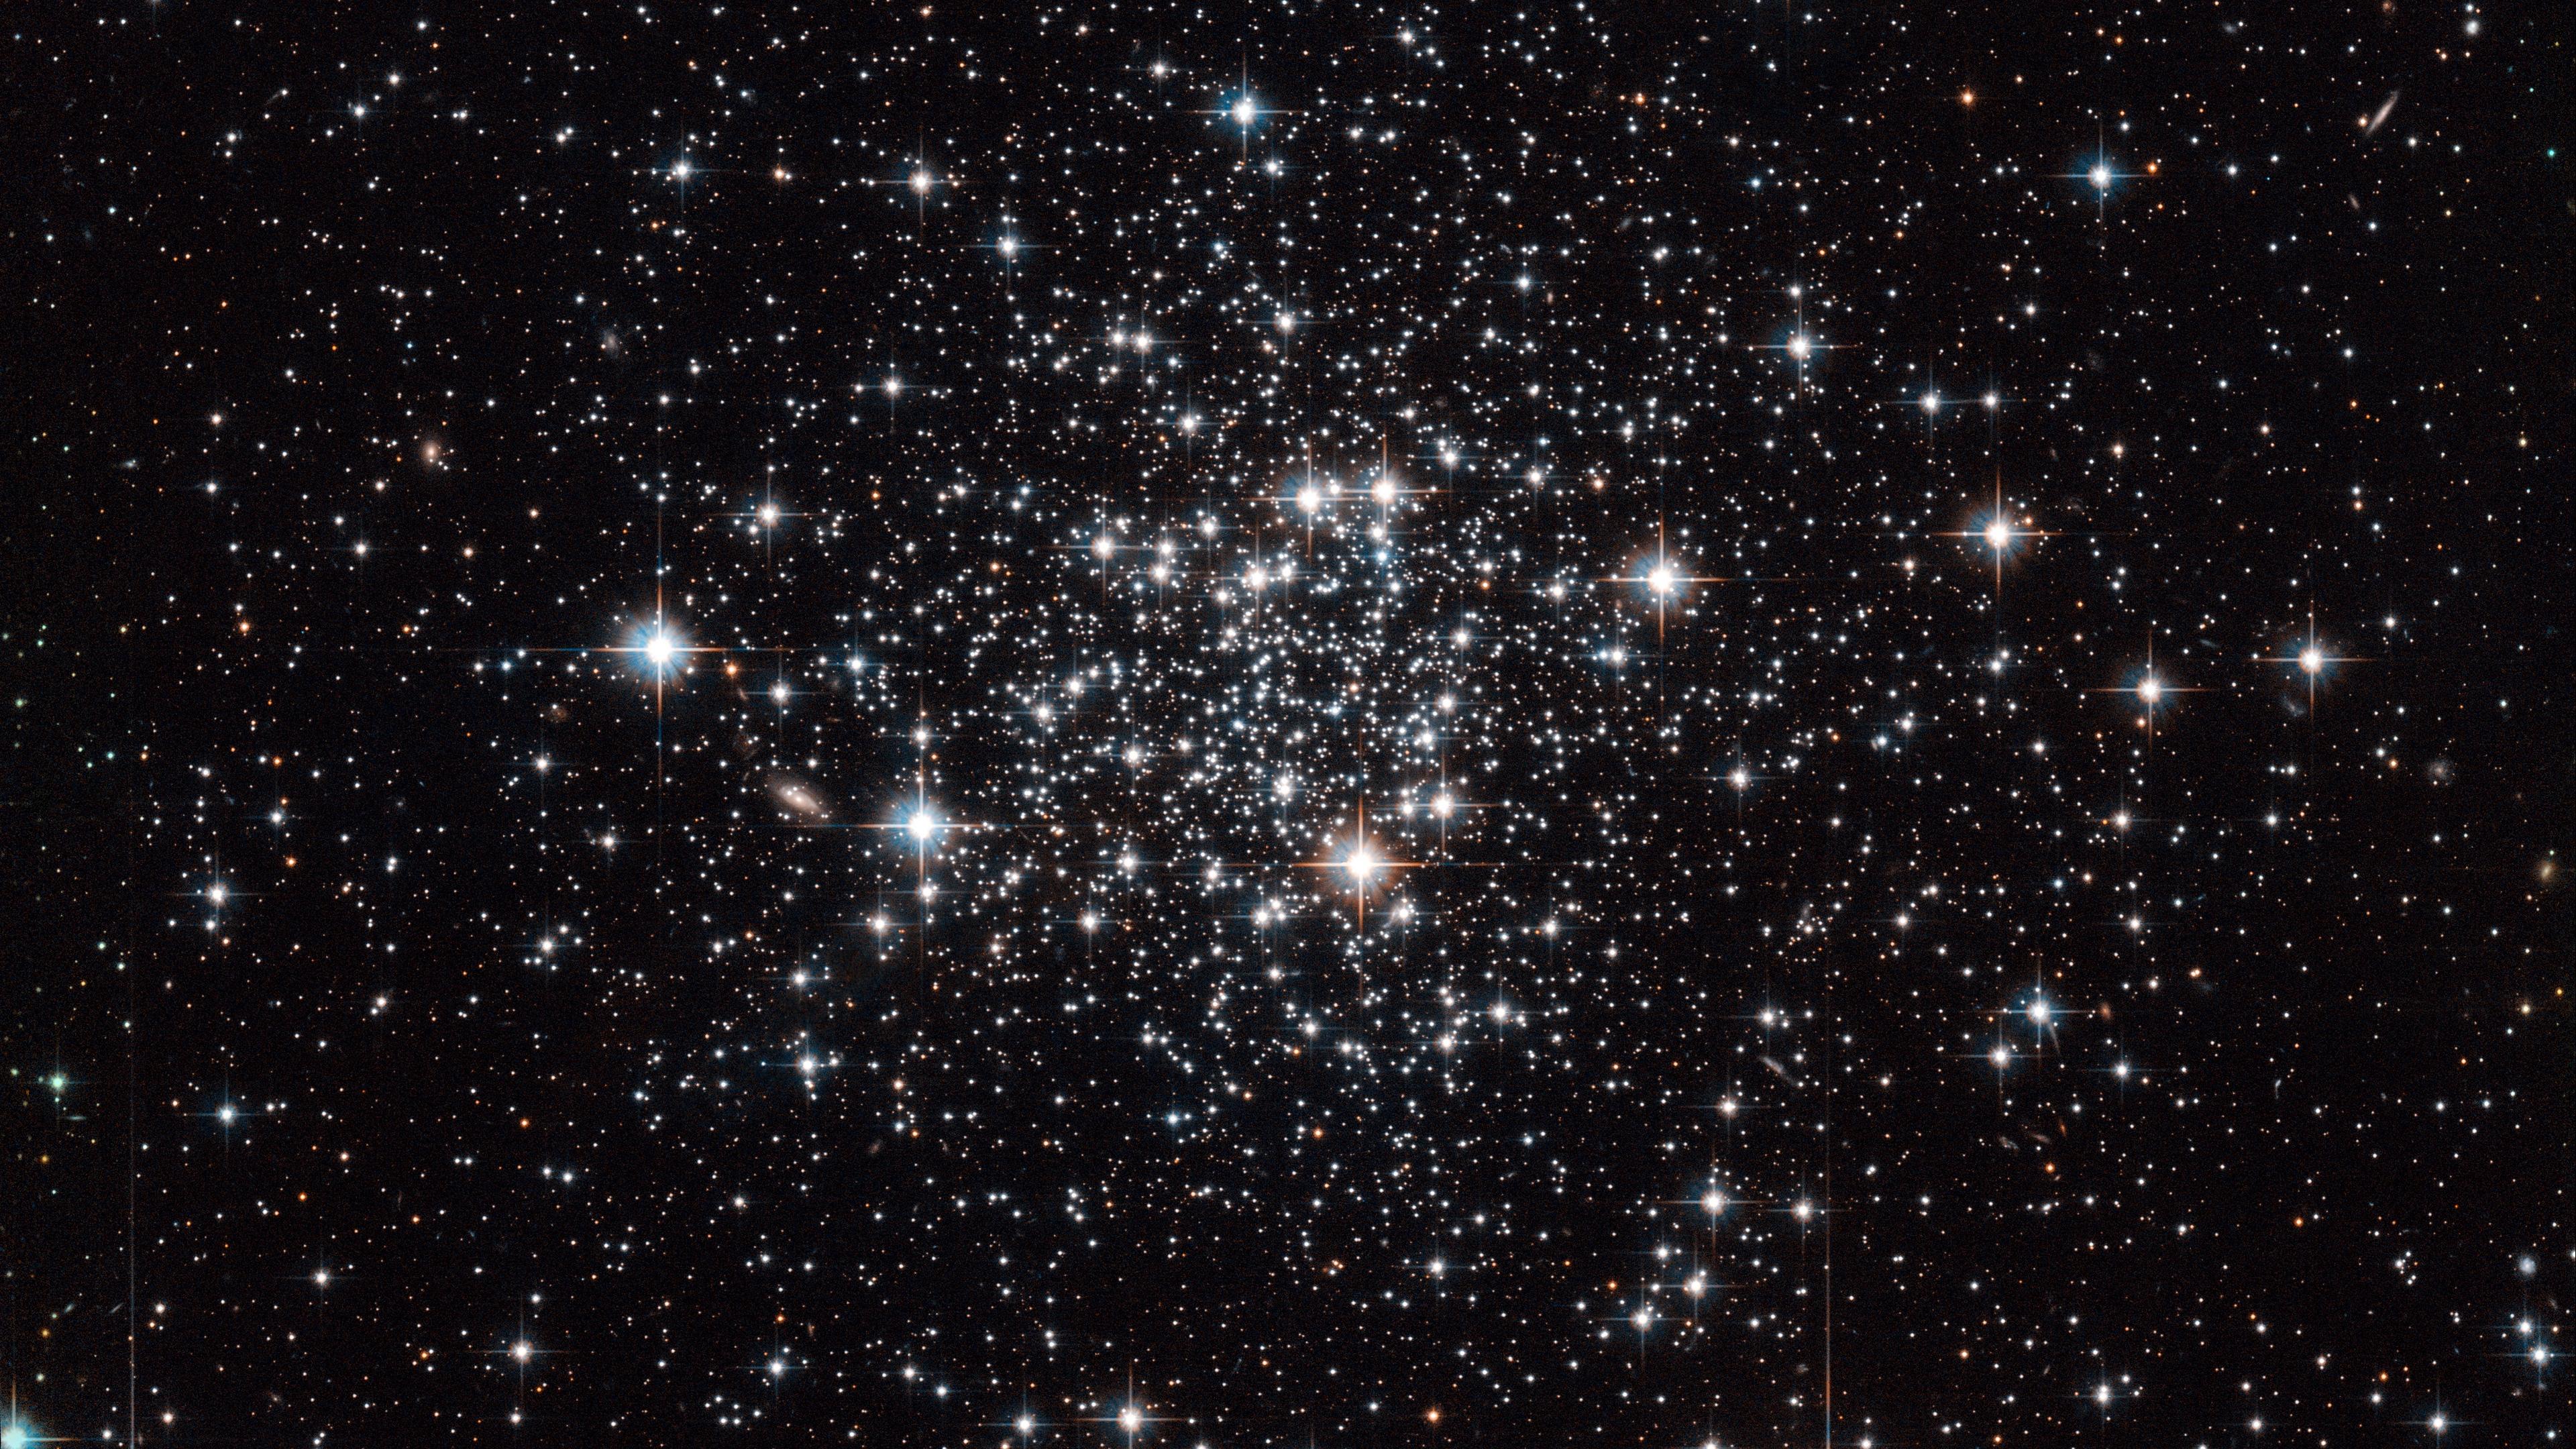 terzan 7 globular cluster galaxy stars starry sky 4k 1536016948 - terzan 7, globular cluster, galaxy, stars, starry sky 4k - terzan 7, globular cluster, Galaxy